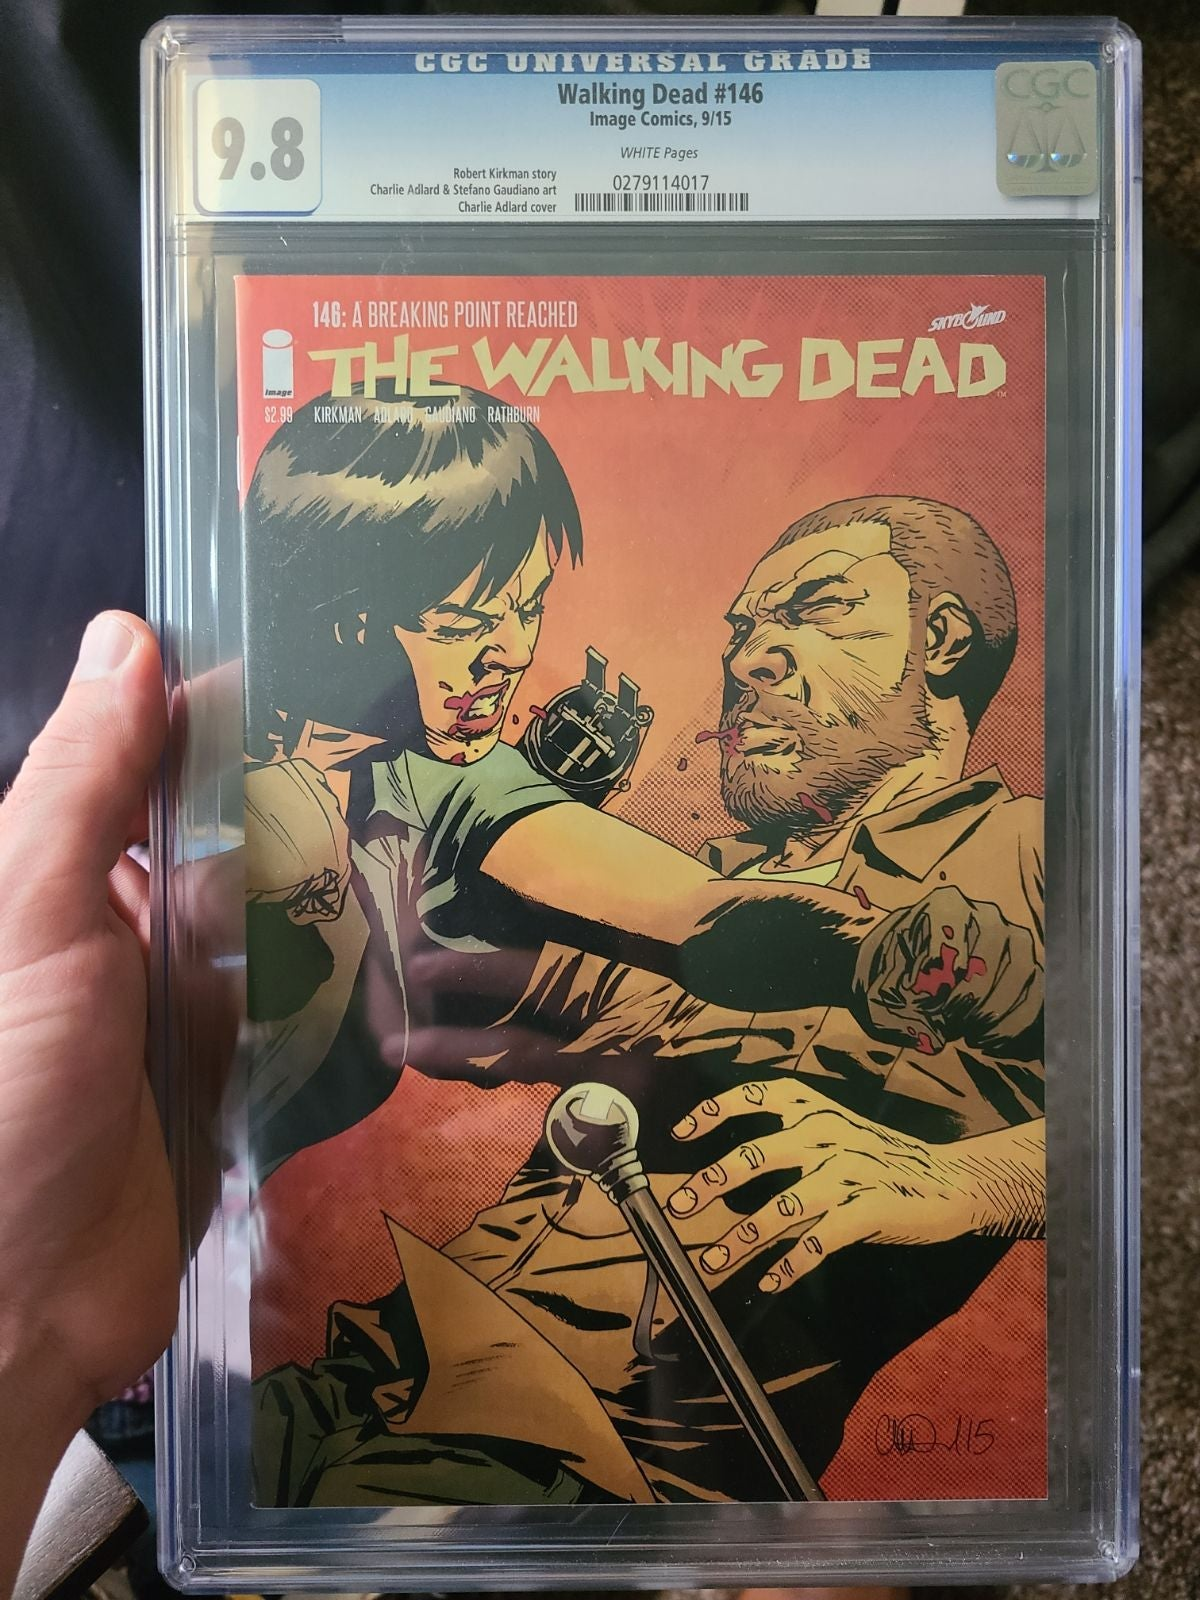 CGC 9.8 Walking Dead #146 Comic